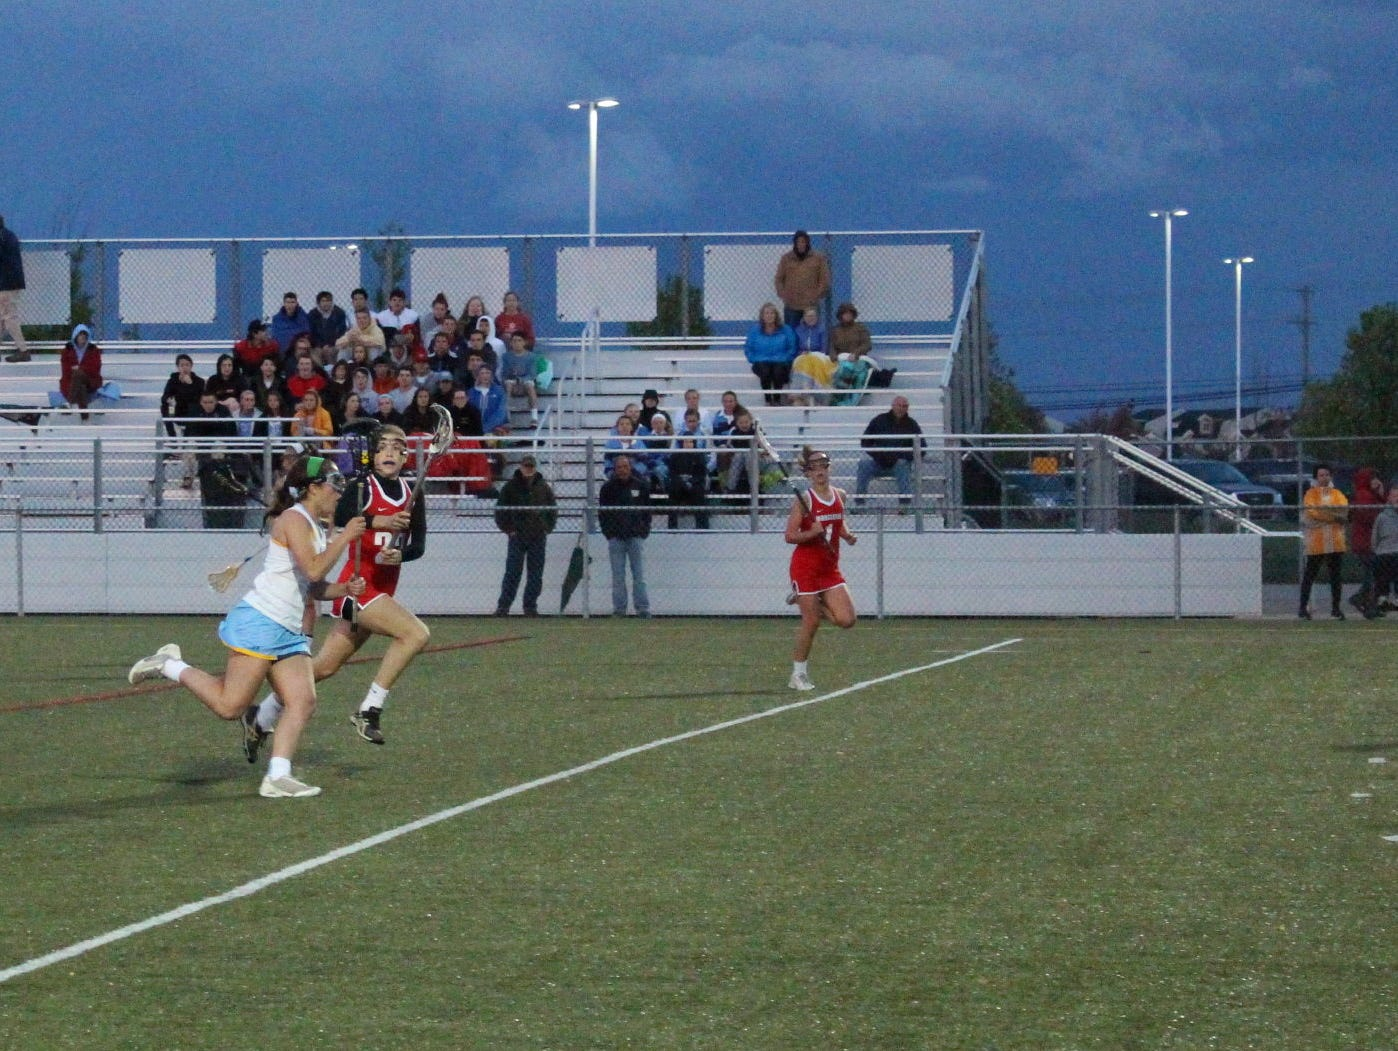 Cape freshman midfielder Katie Frederick runs the ball up field.